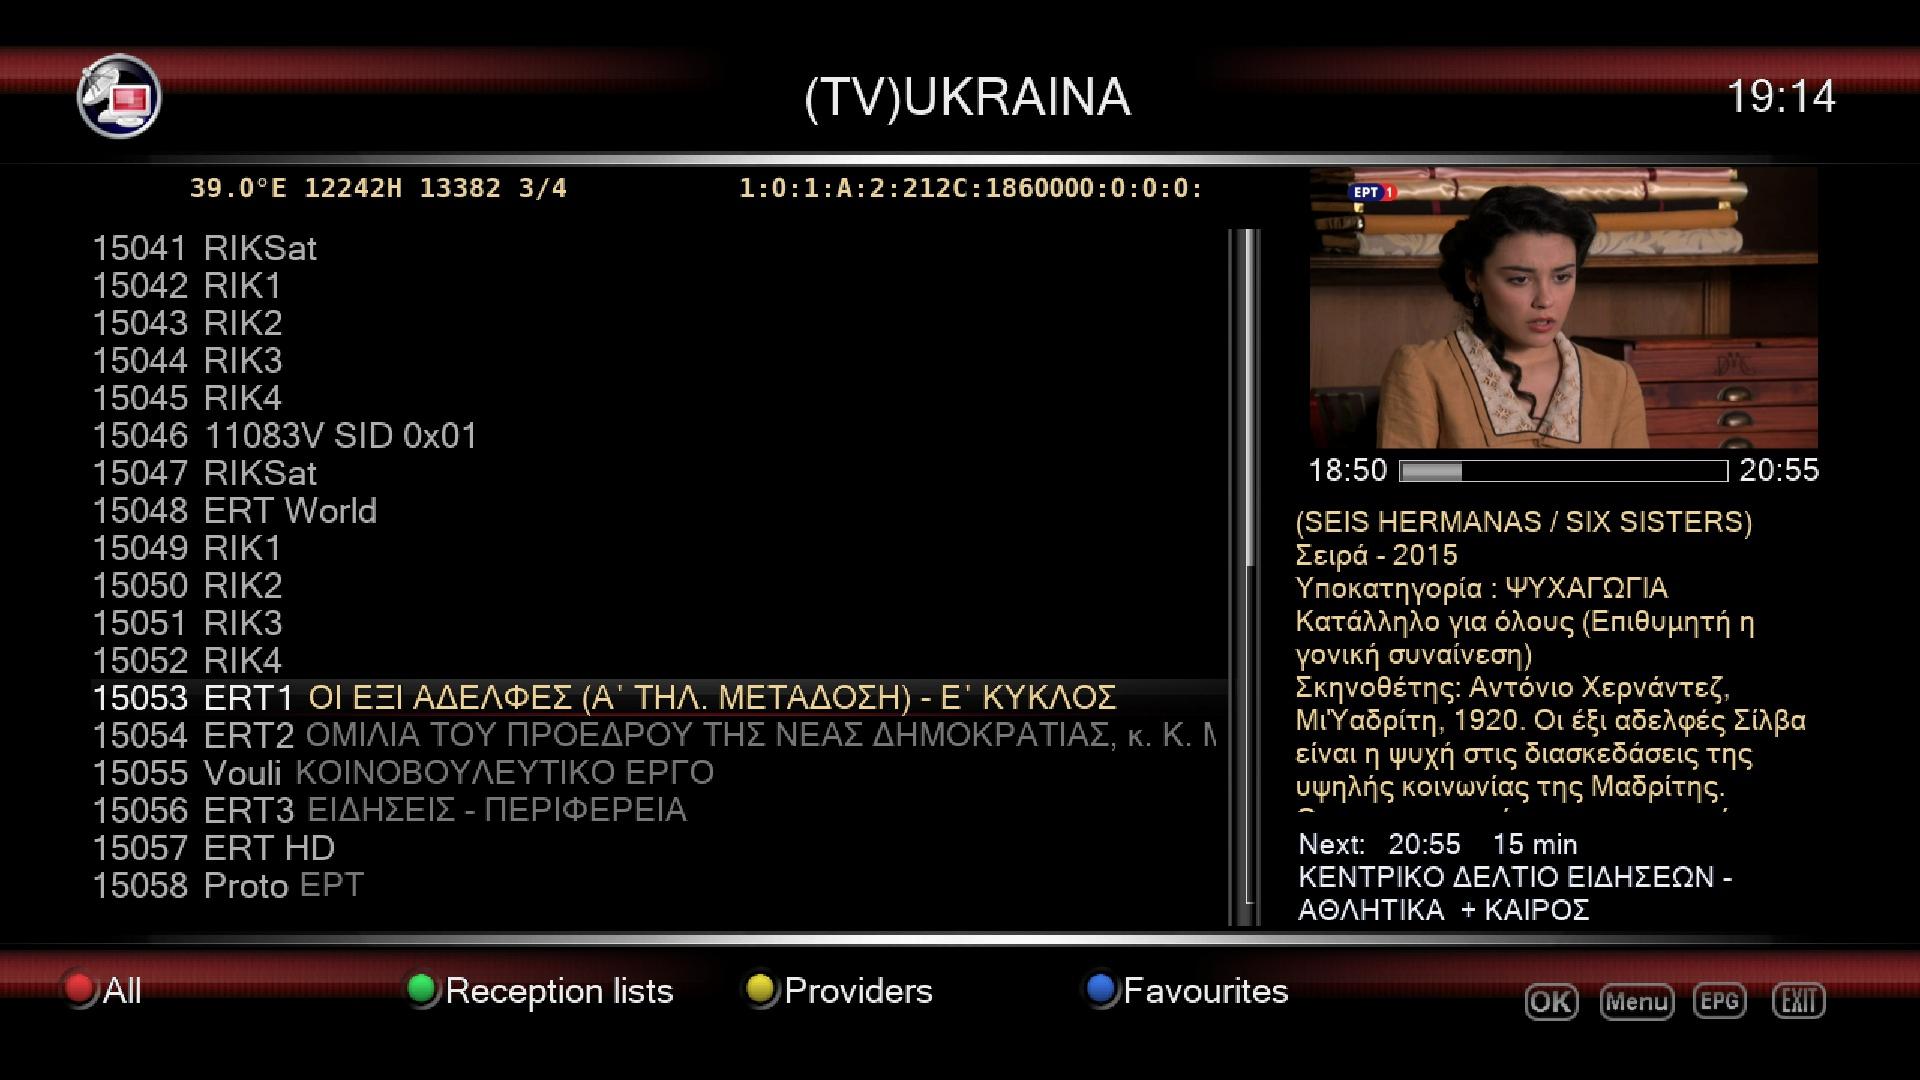 12463H / 28330 @ Hellas Sat 3 - Page 6 - Digital TV Forums